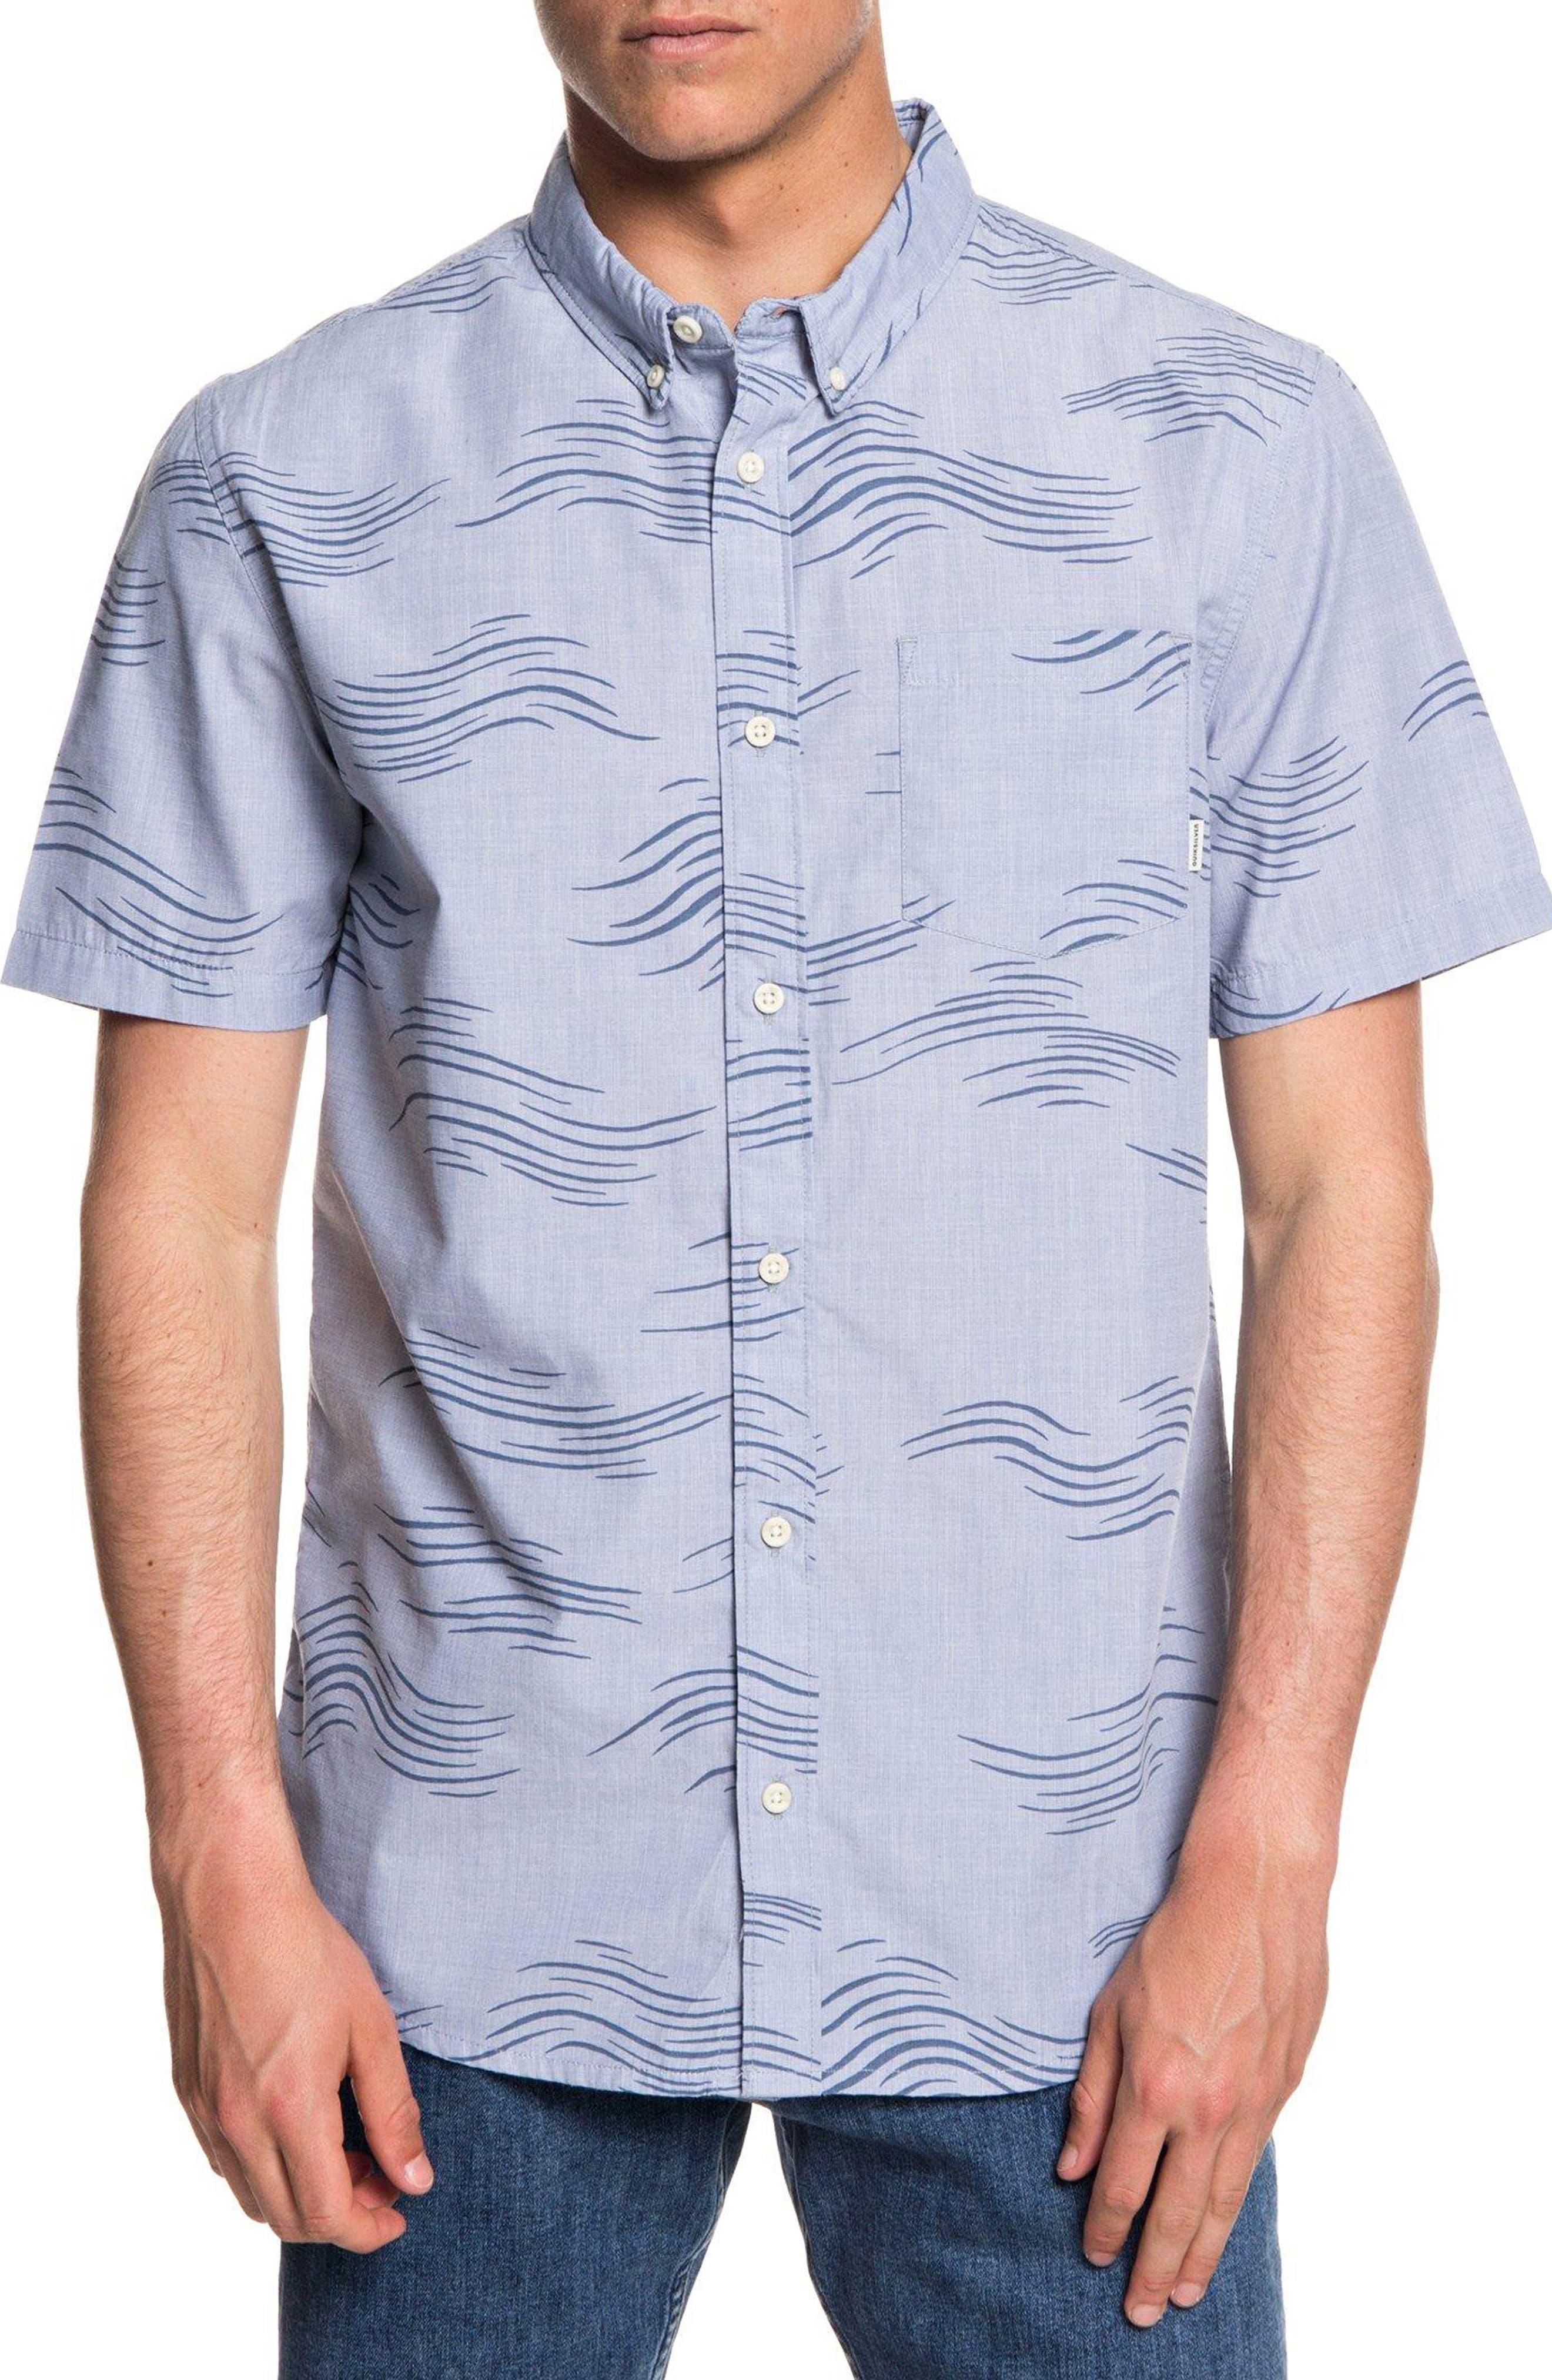 Valley Groove Print Woven Shirt,                             Main thumbnail 1, color,                             BIJOU BLUE VALLEY GROVE